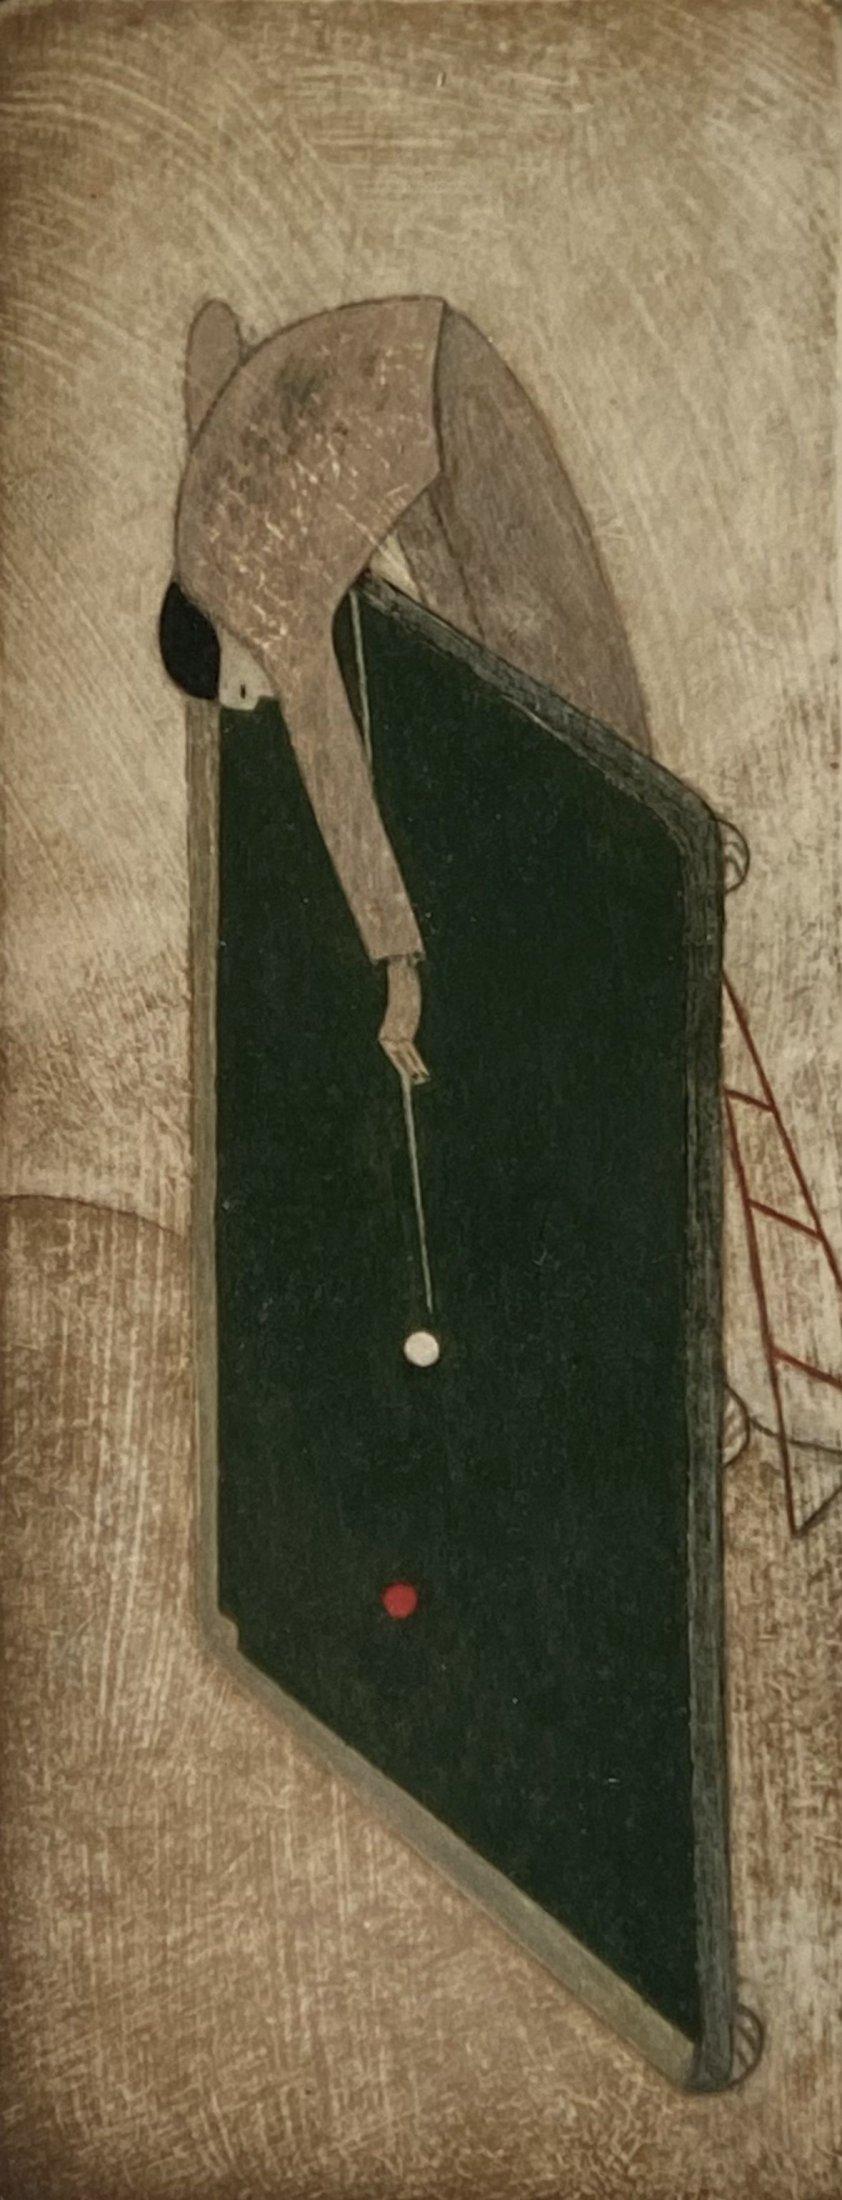 Vertical Billiards